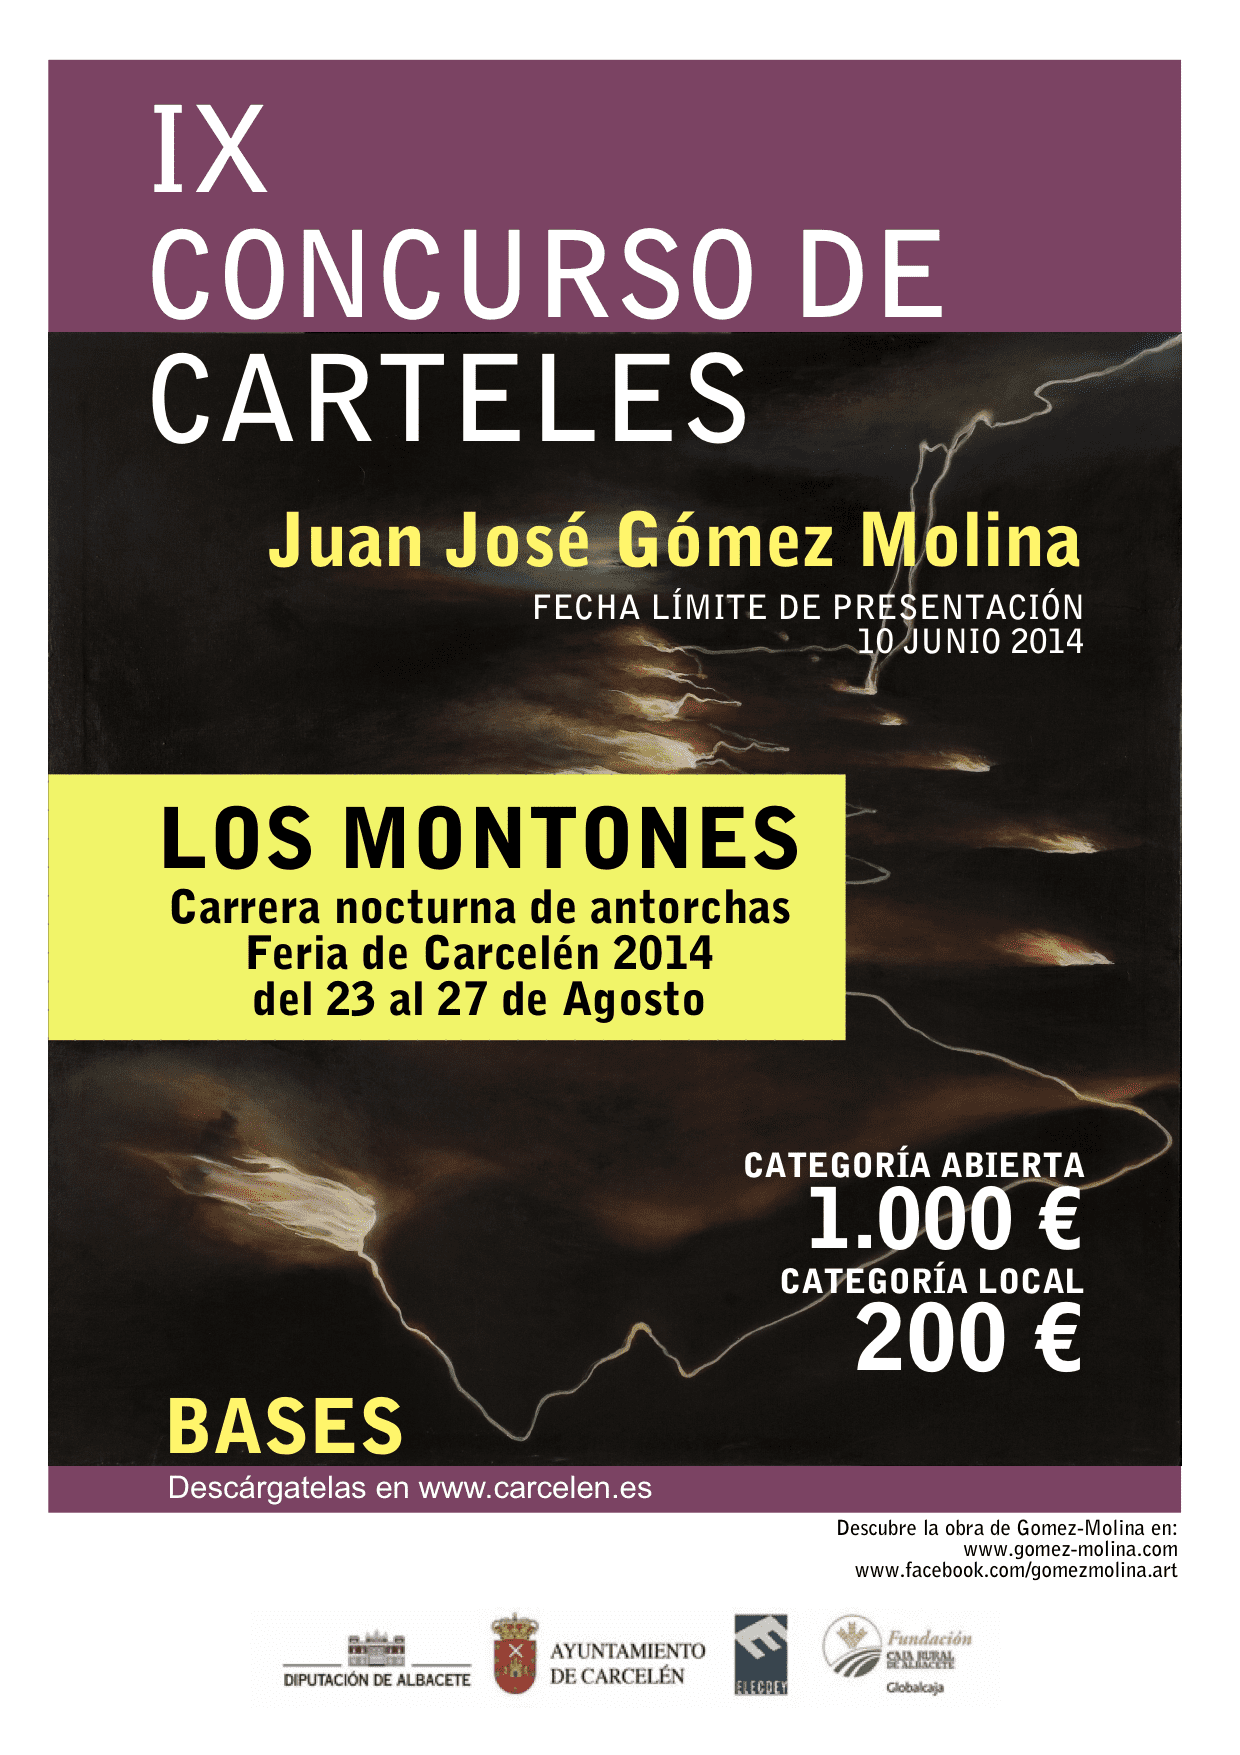 CARTEL CONCURSO JJGM2014